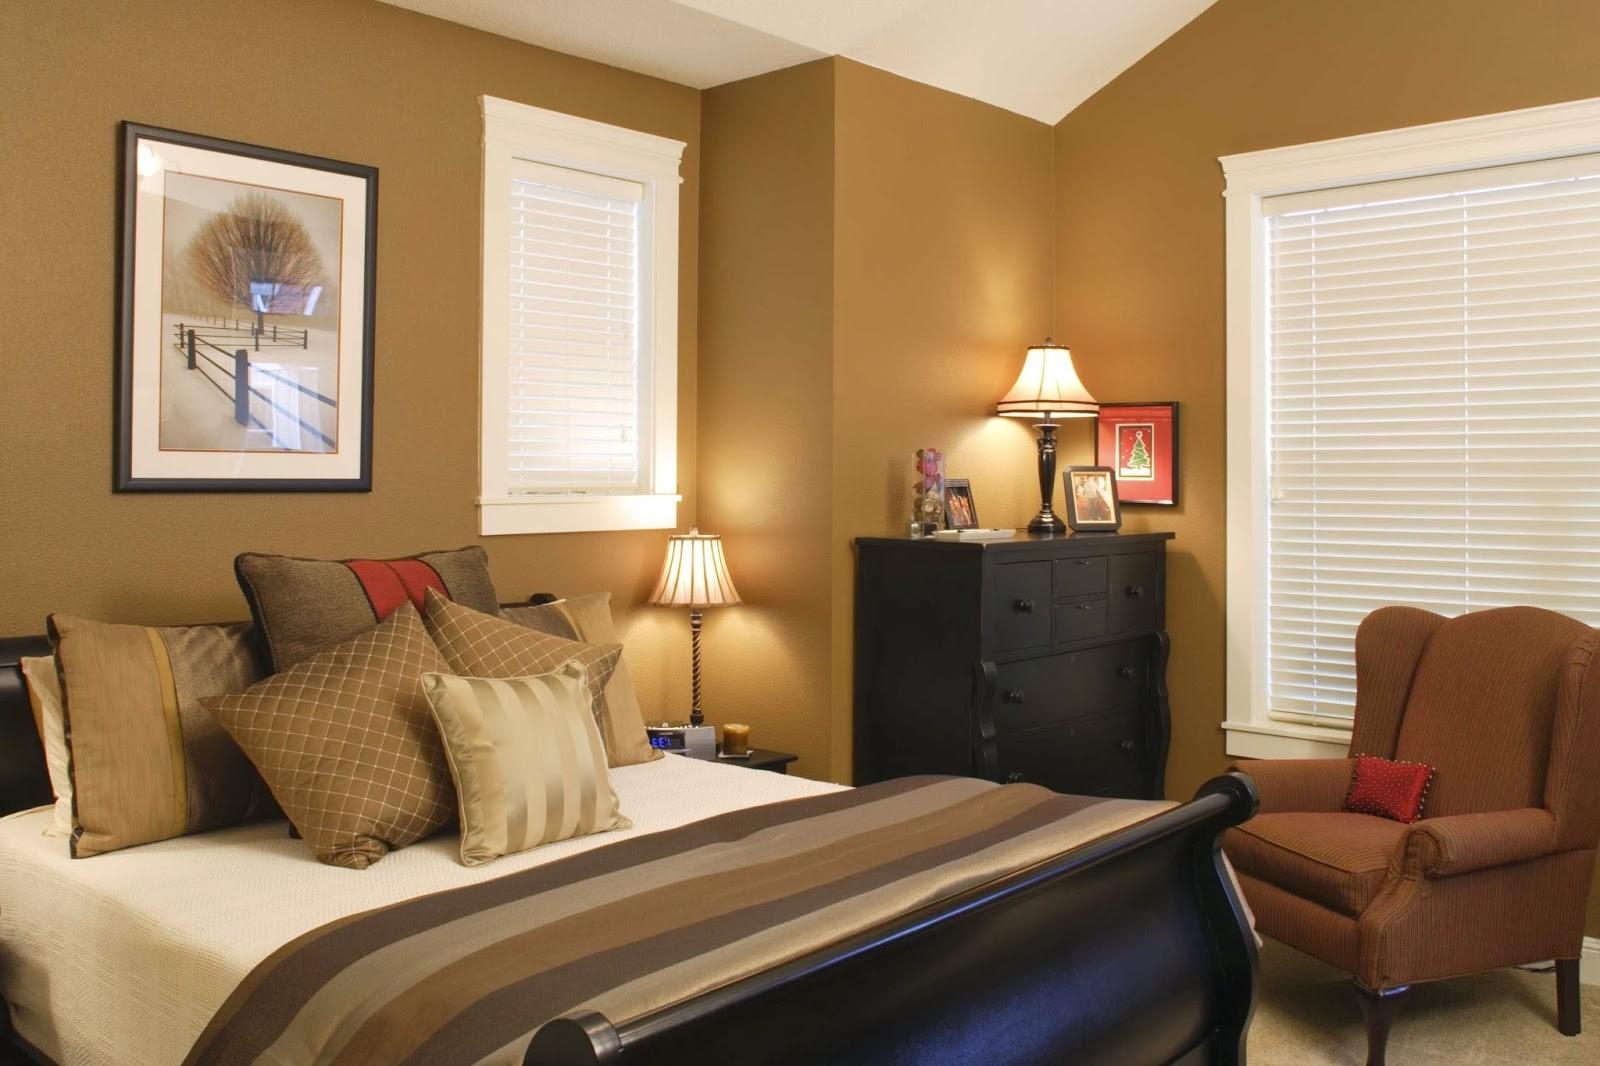 warna cat buat kamar tidur utama 2